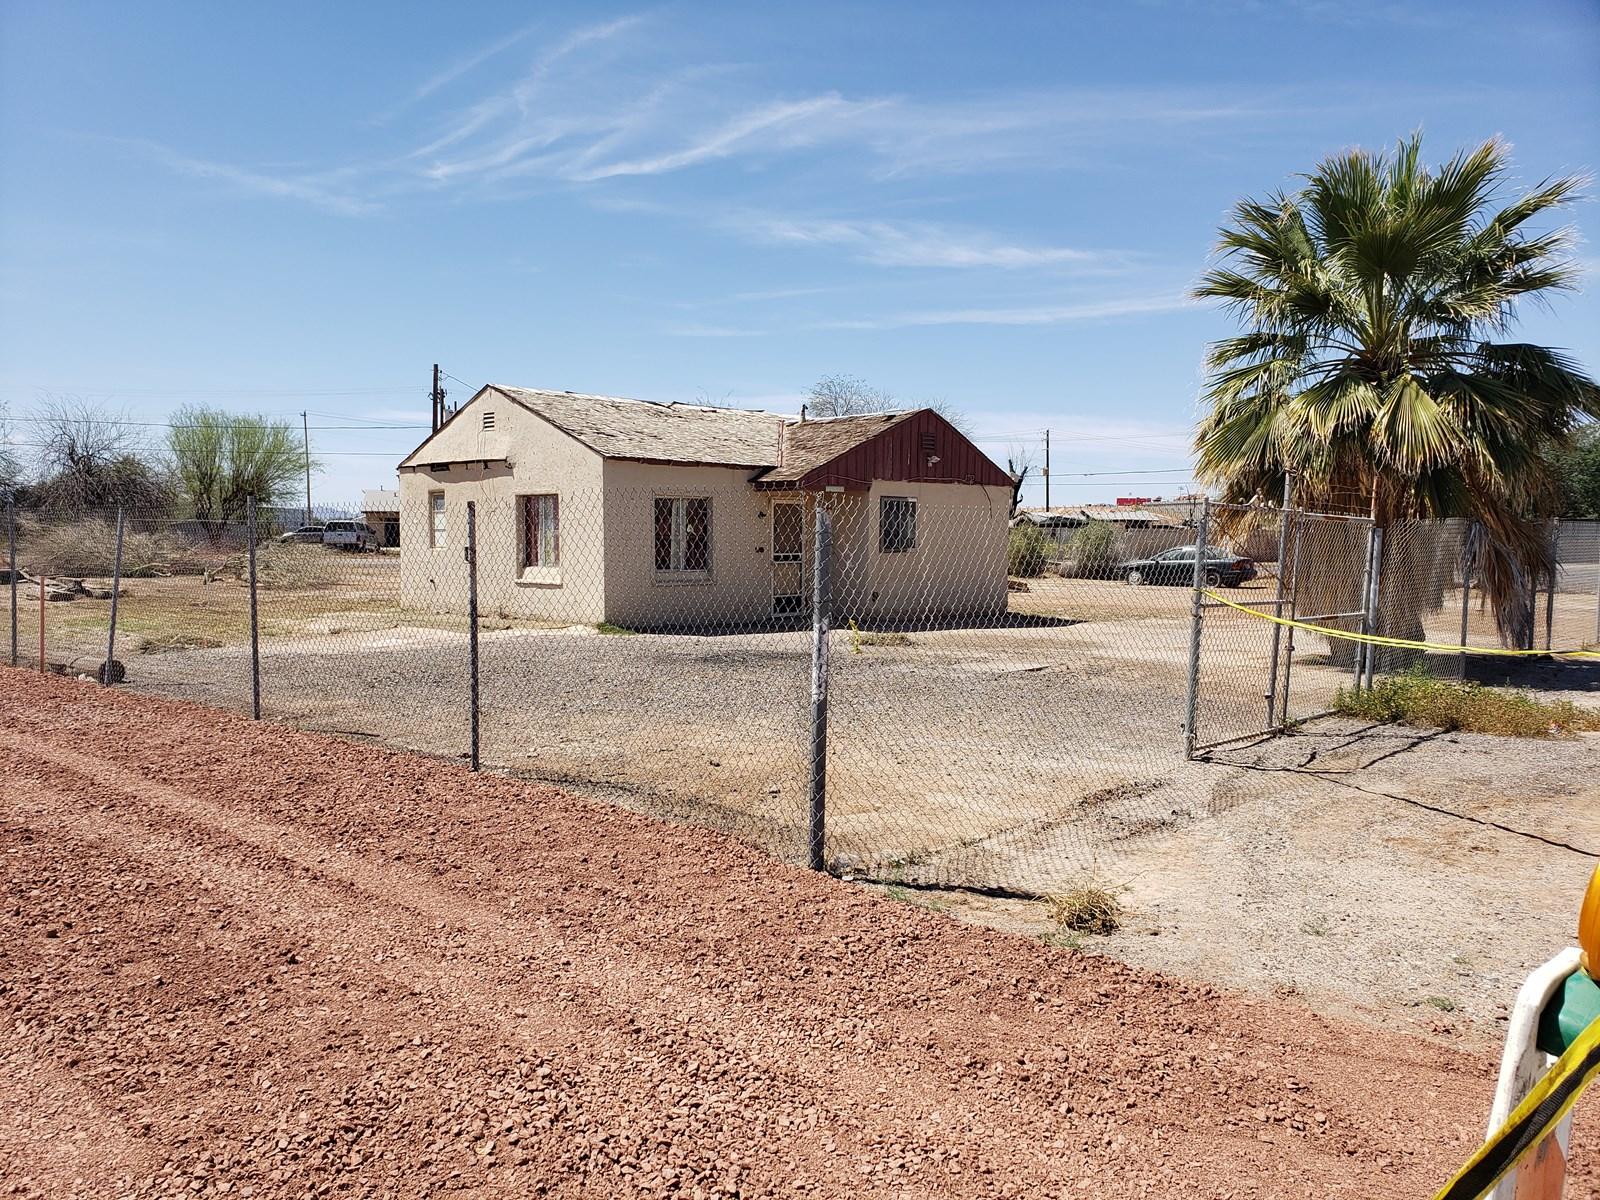 Lot for sale Maricopa City Arizona. Prime location for sale